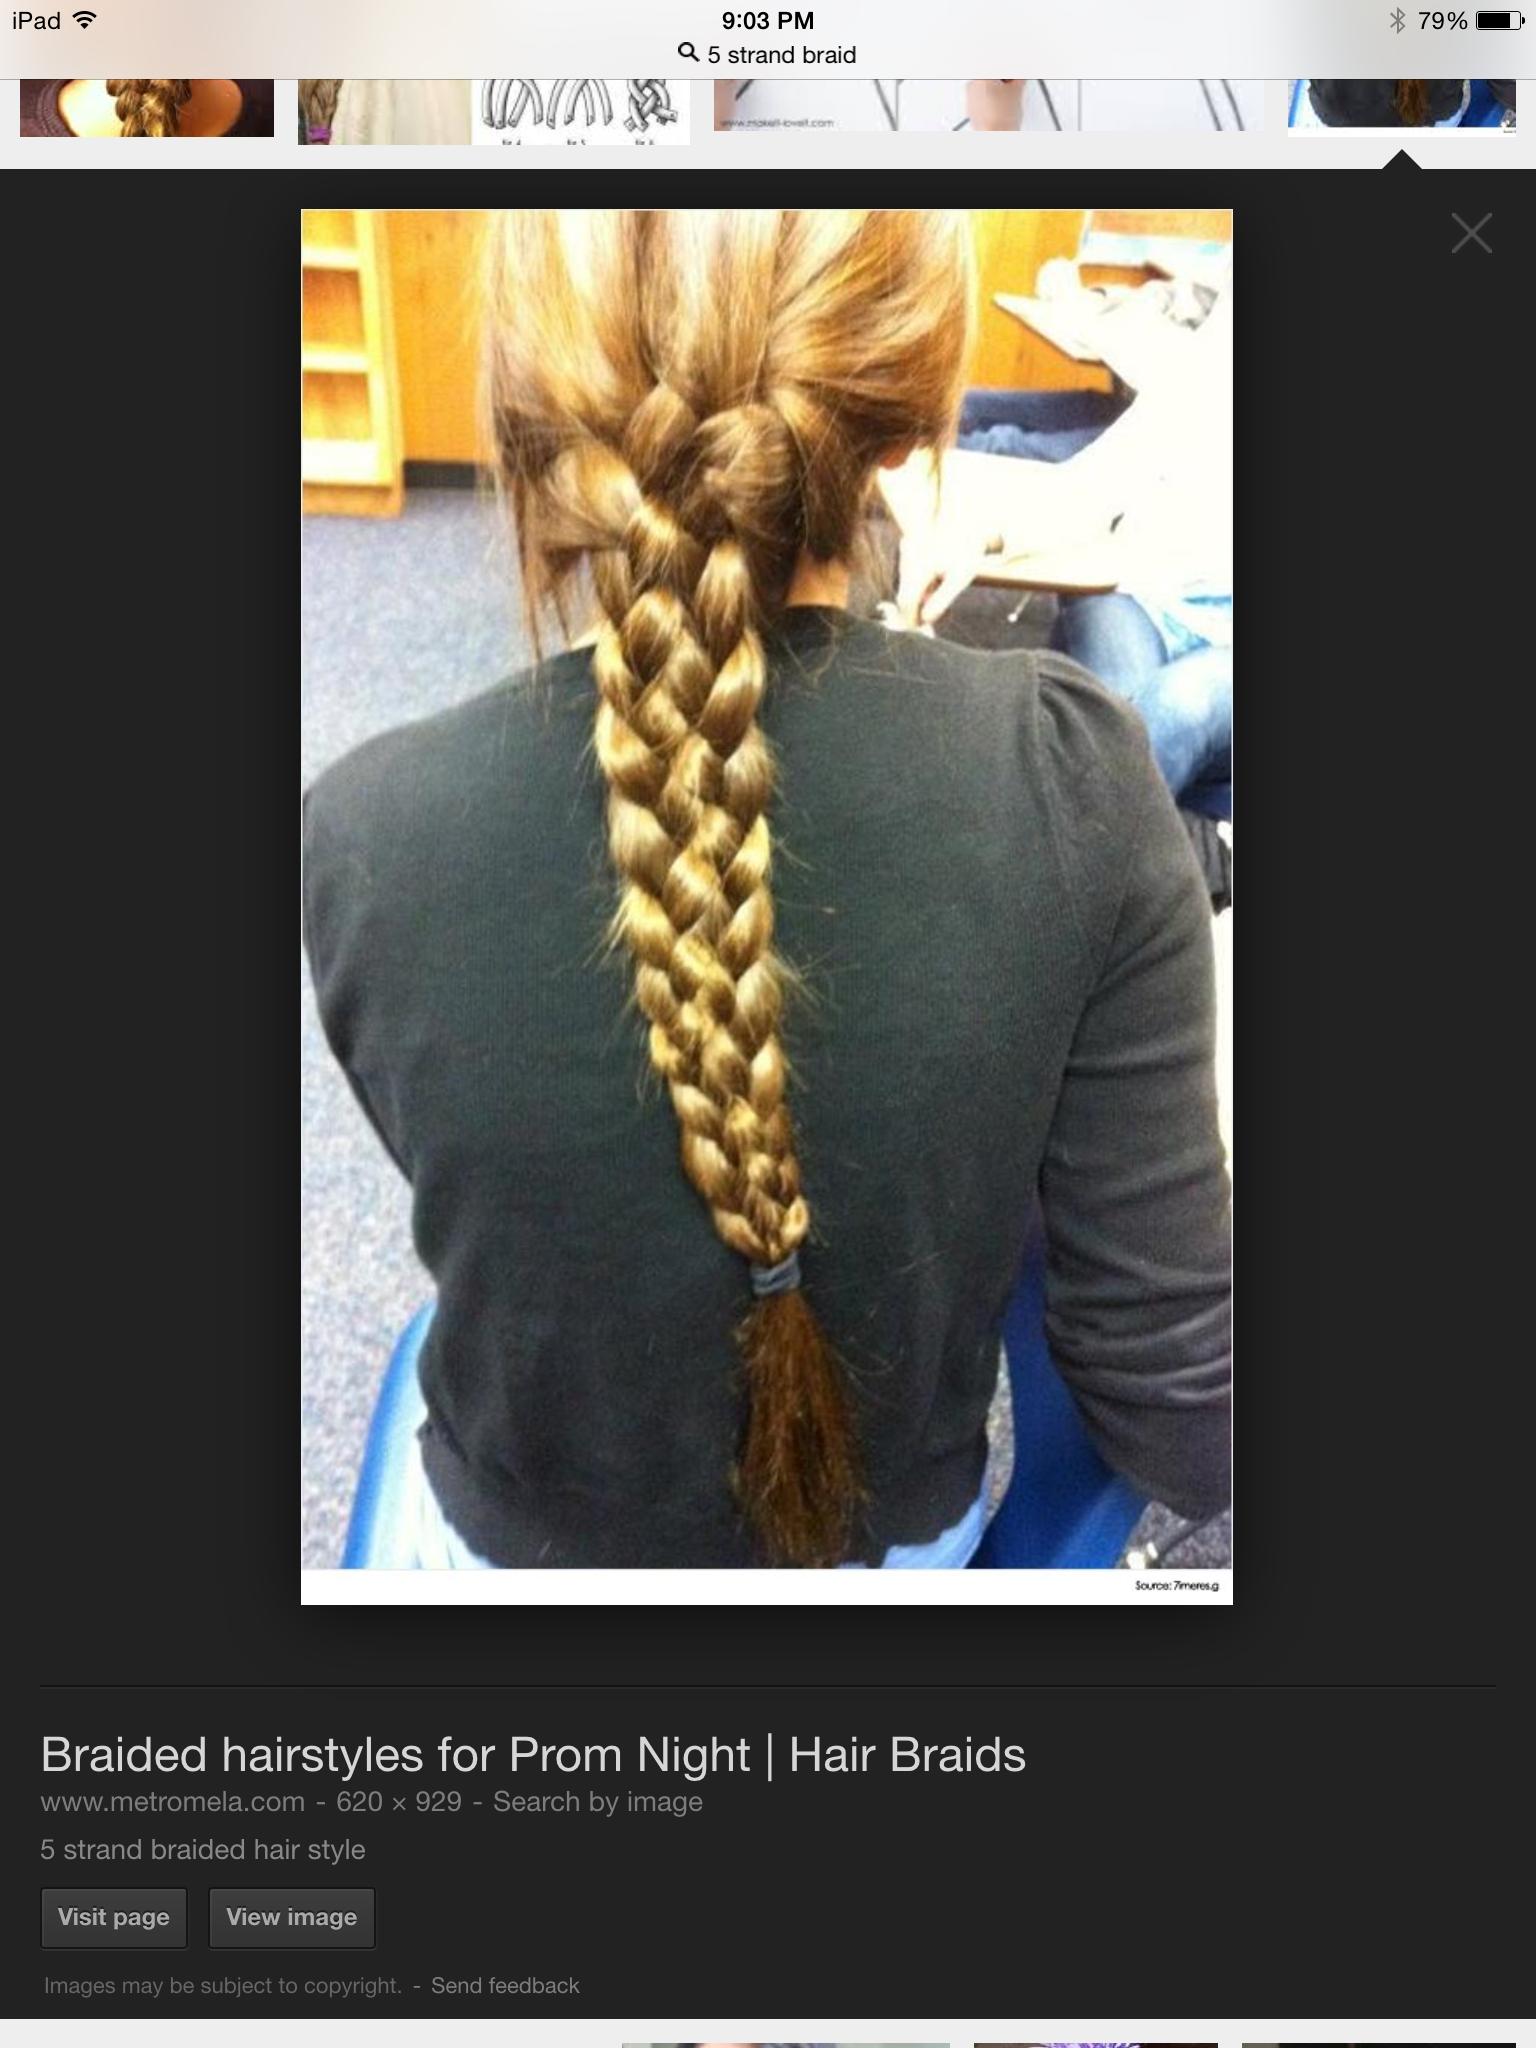 5 STRAND BRAID!!!! Gorgeous!!!http://www.google.com/imgres?imgurl=http://www.metromela.com/wp-content/uploads/2014/07/5-strand-braided-hair-style.jpg&imgrefurl=http://www.metromela.com/braided-hairstyles-for-prom-night/&h=929&w=620&tbnid=i8RZcH262uZ06M:&zoom=1&docid=MkFmKChu-ByFGM&hl=en&ei=7_HGVOzpJ4OdNs_Zg6gM&tbm=isch&client=safari&ved=0CEQQMygVMBU